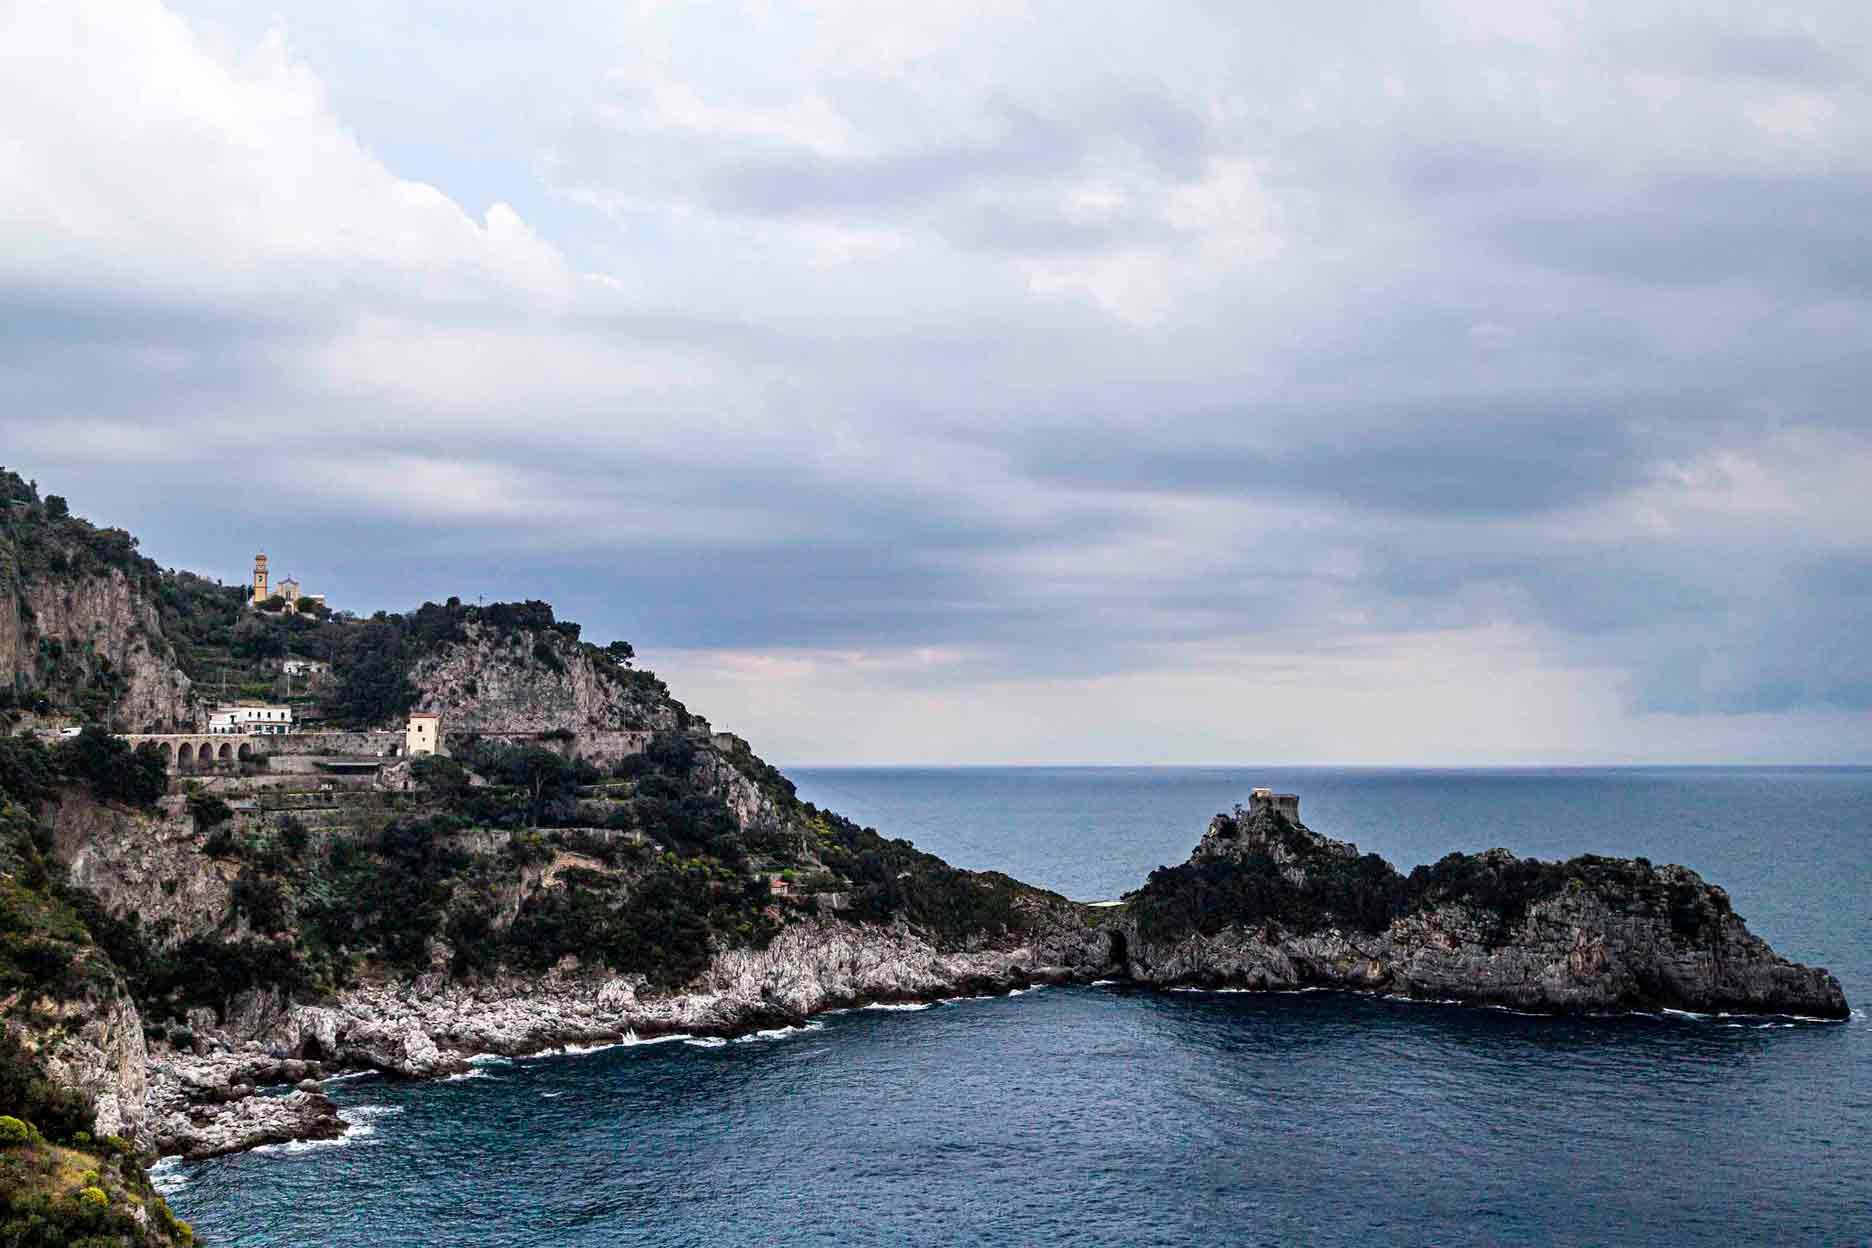 Tela Em Costa Amalfitana